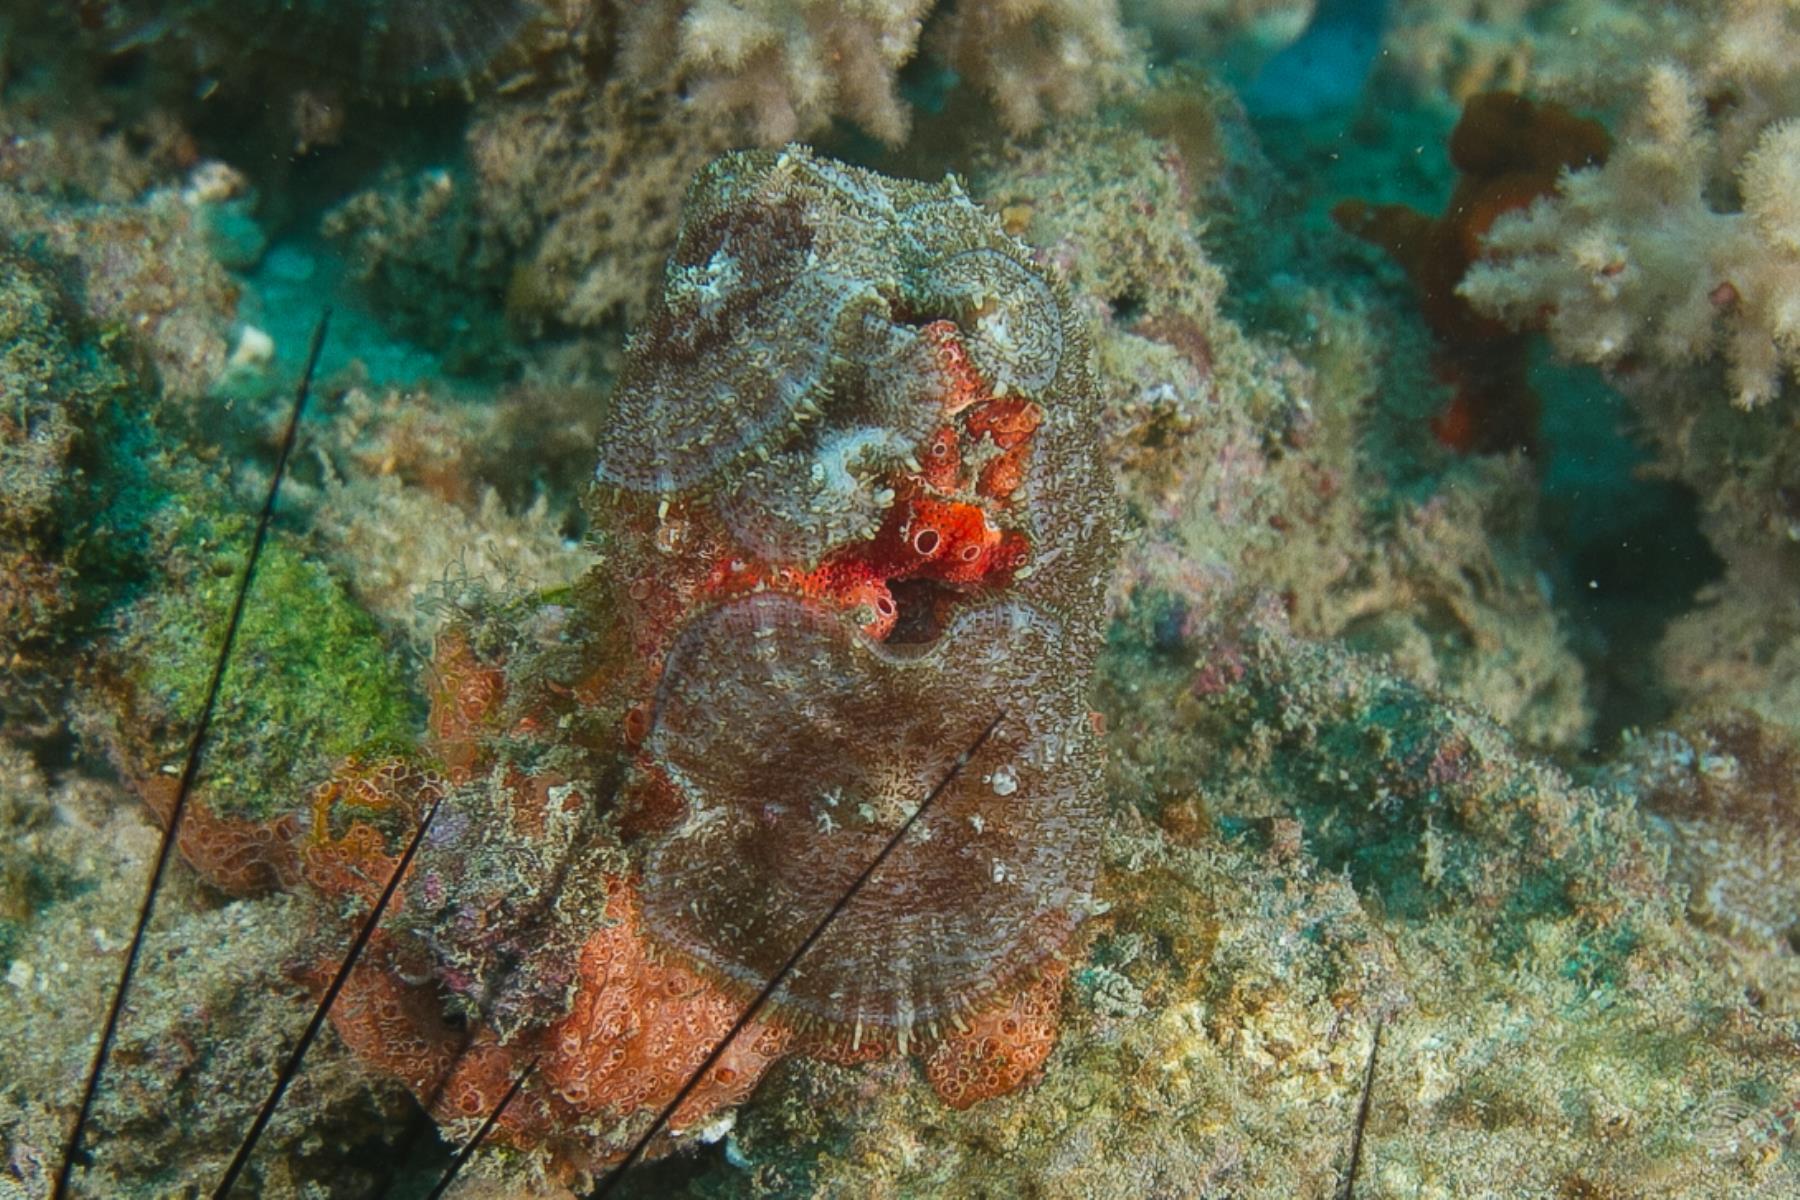 Slipper coral Herpolitha limax acanthocauli